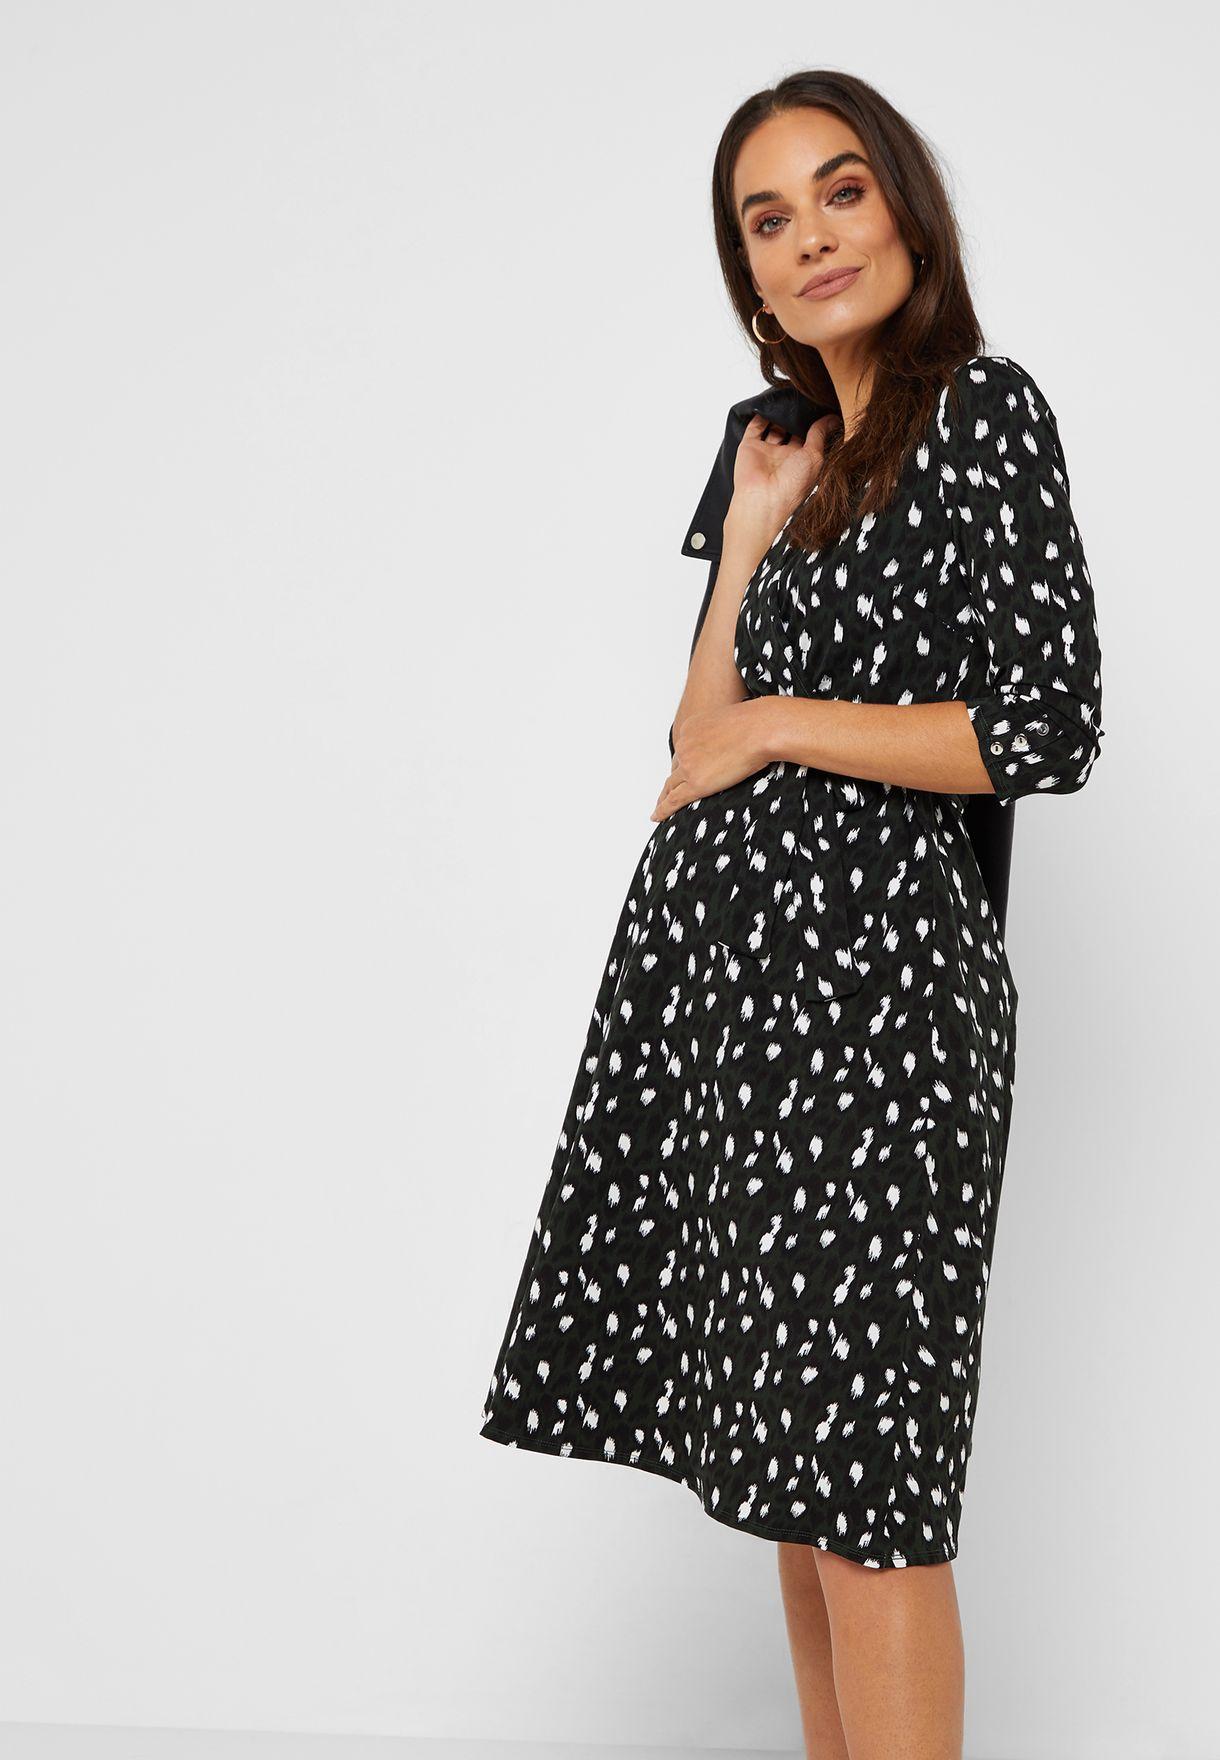 ed2b0b3b26 Shop Dorothy Perkins Maternity prints Tie Waist Wrap Dress 17207775 ...